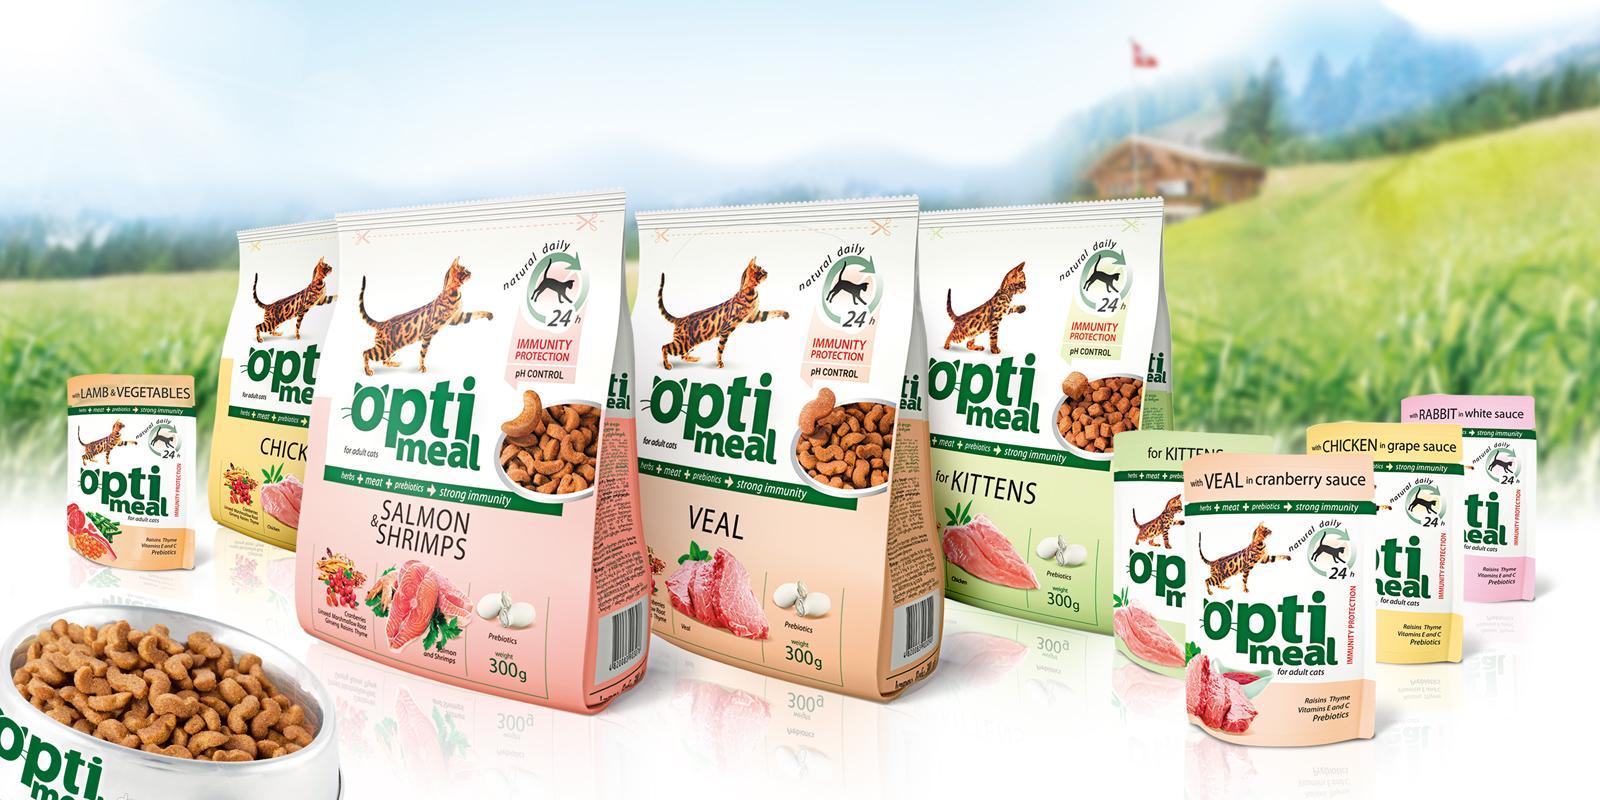 "ТМ Optimeal;;;;;;Разработка дизайна упаковок корма для котов ТМ Optimeal ;;;;;;<span>Клиент:</span> Компания ""Кормотех"";;;;;;;;;;;;Разработка дизайна упаковок корма для котов ТМ Optimeal ;;;;;;2"